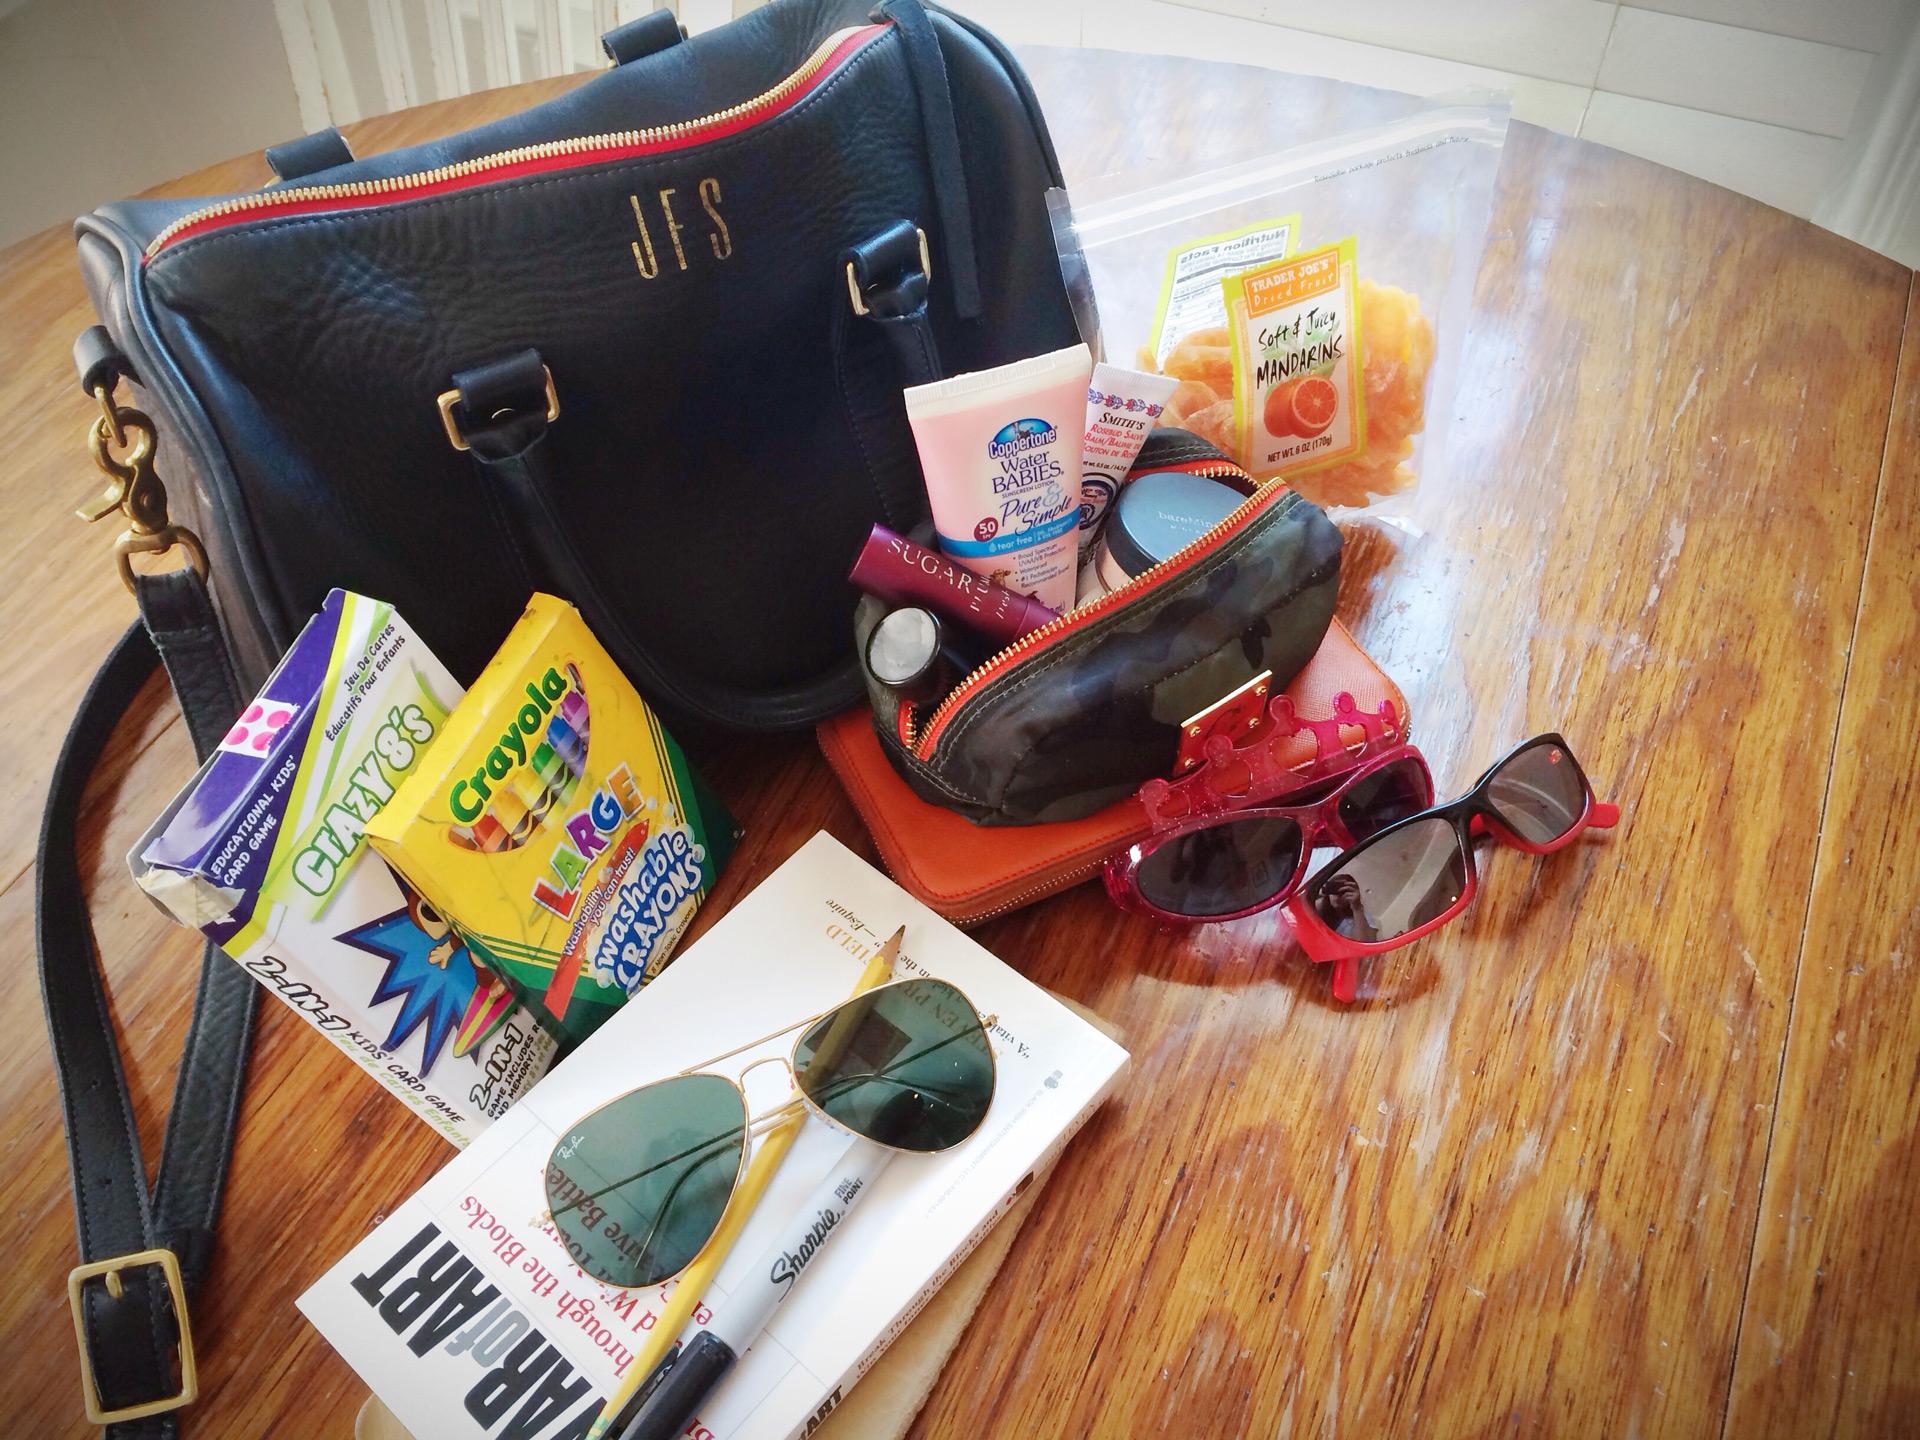 Jenny Feldon's purse | Sheknows.com